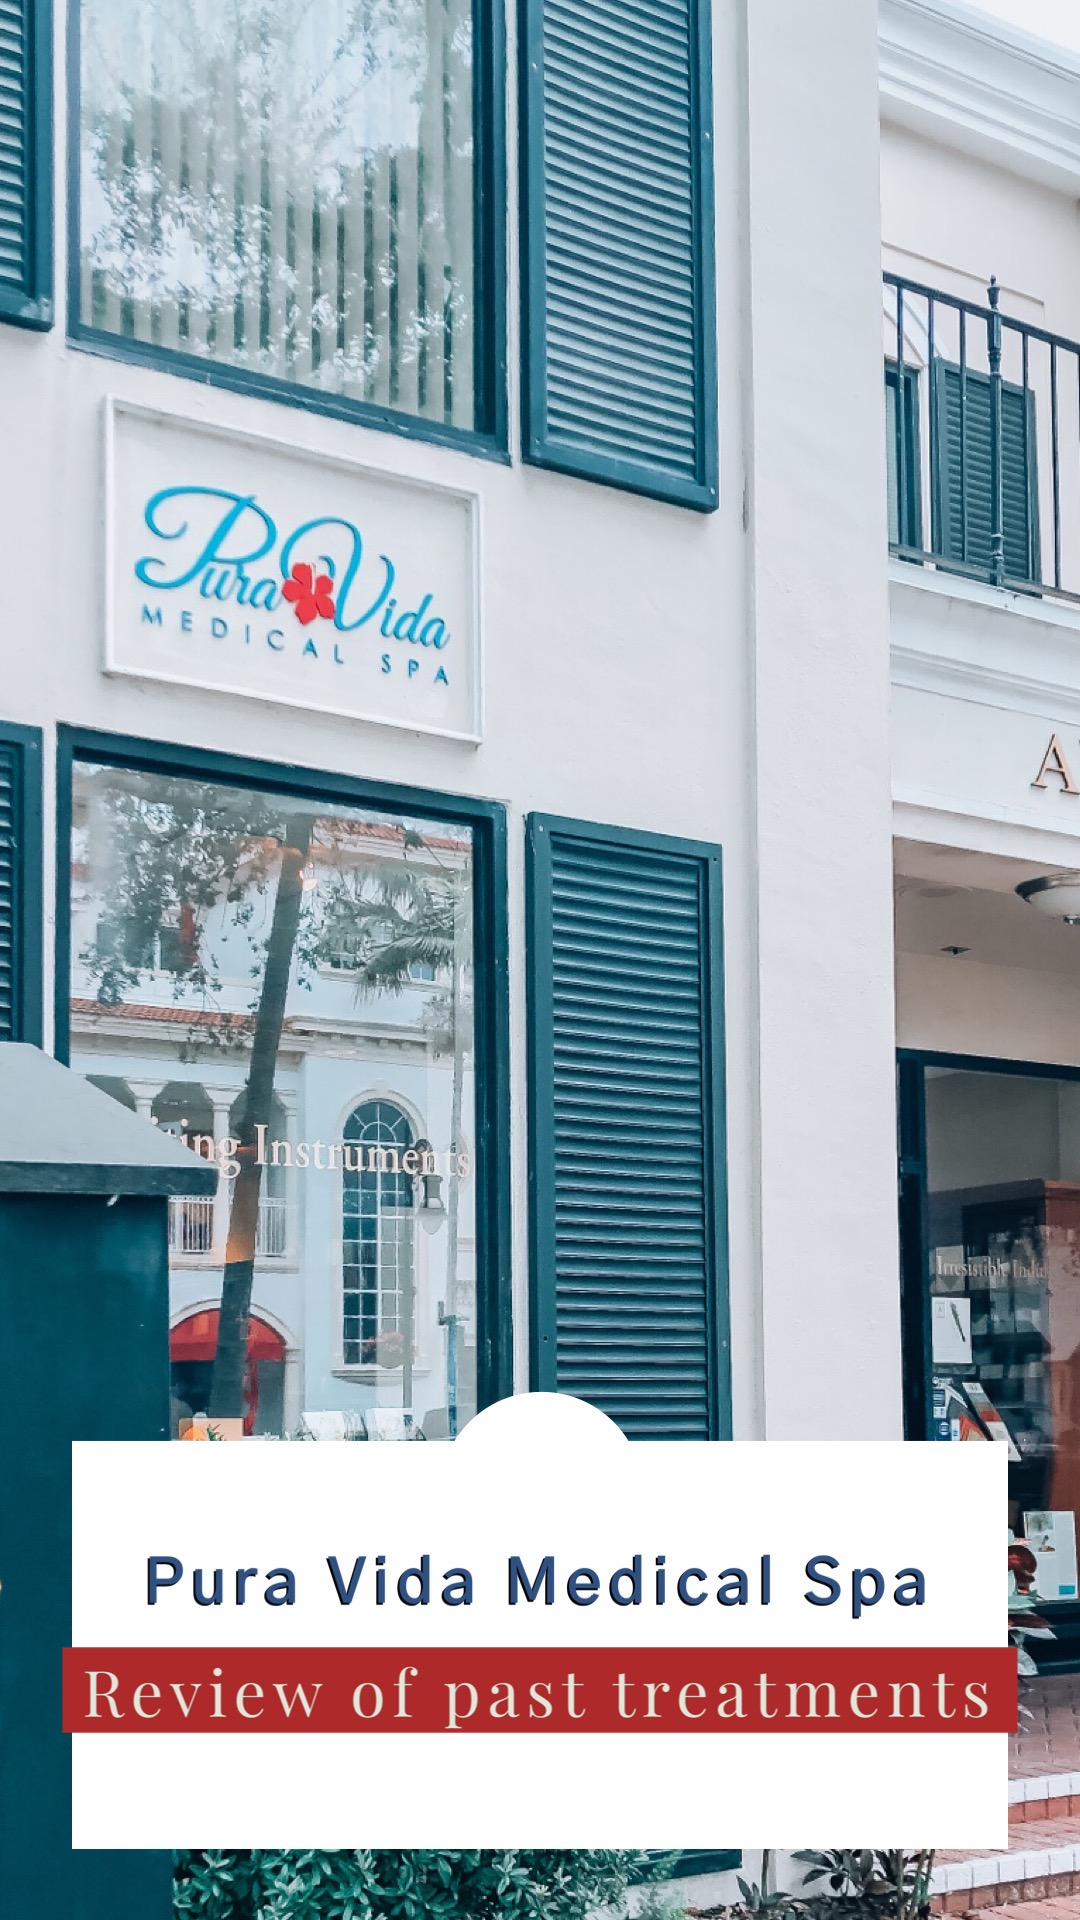 Naples, FL Medical Spa Review